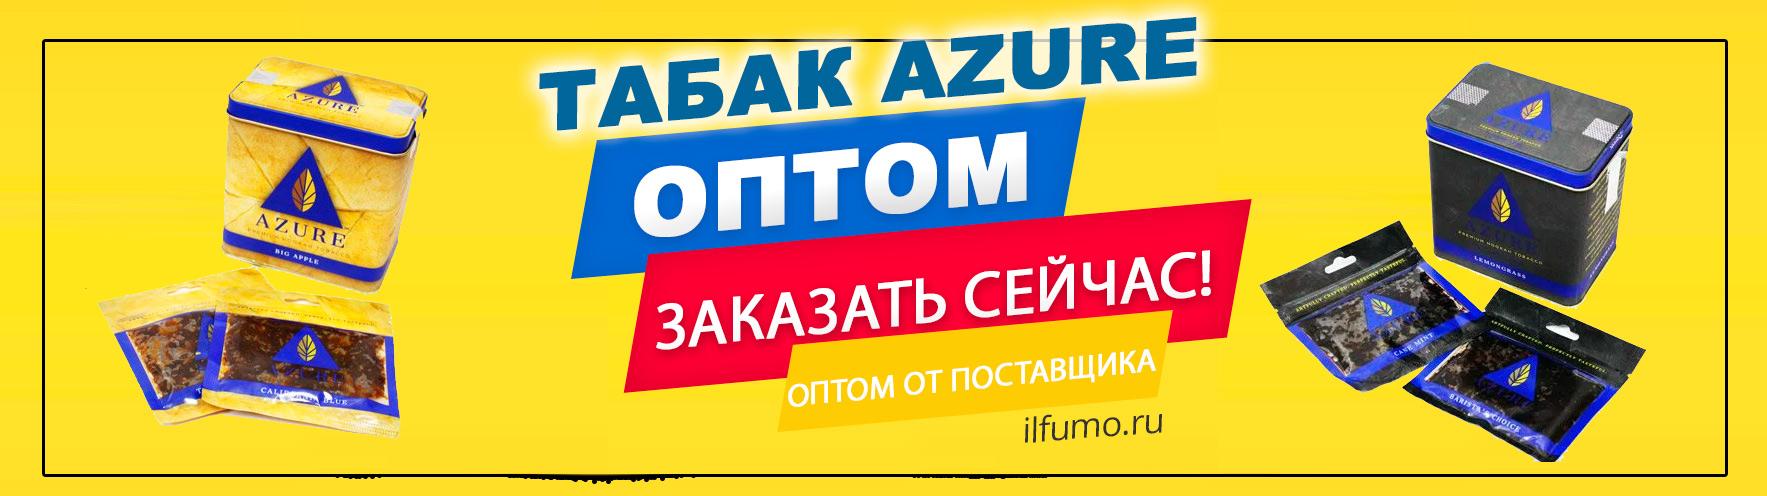 tabak dlja kaljana azure optom - Табак для кальяна Azure